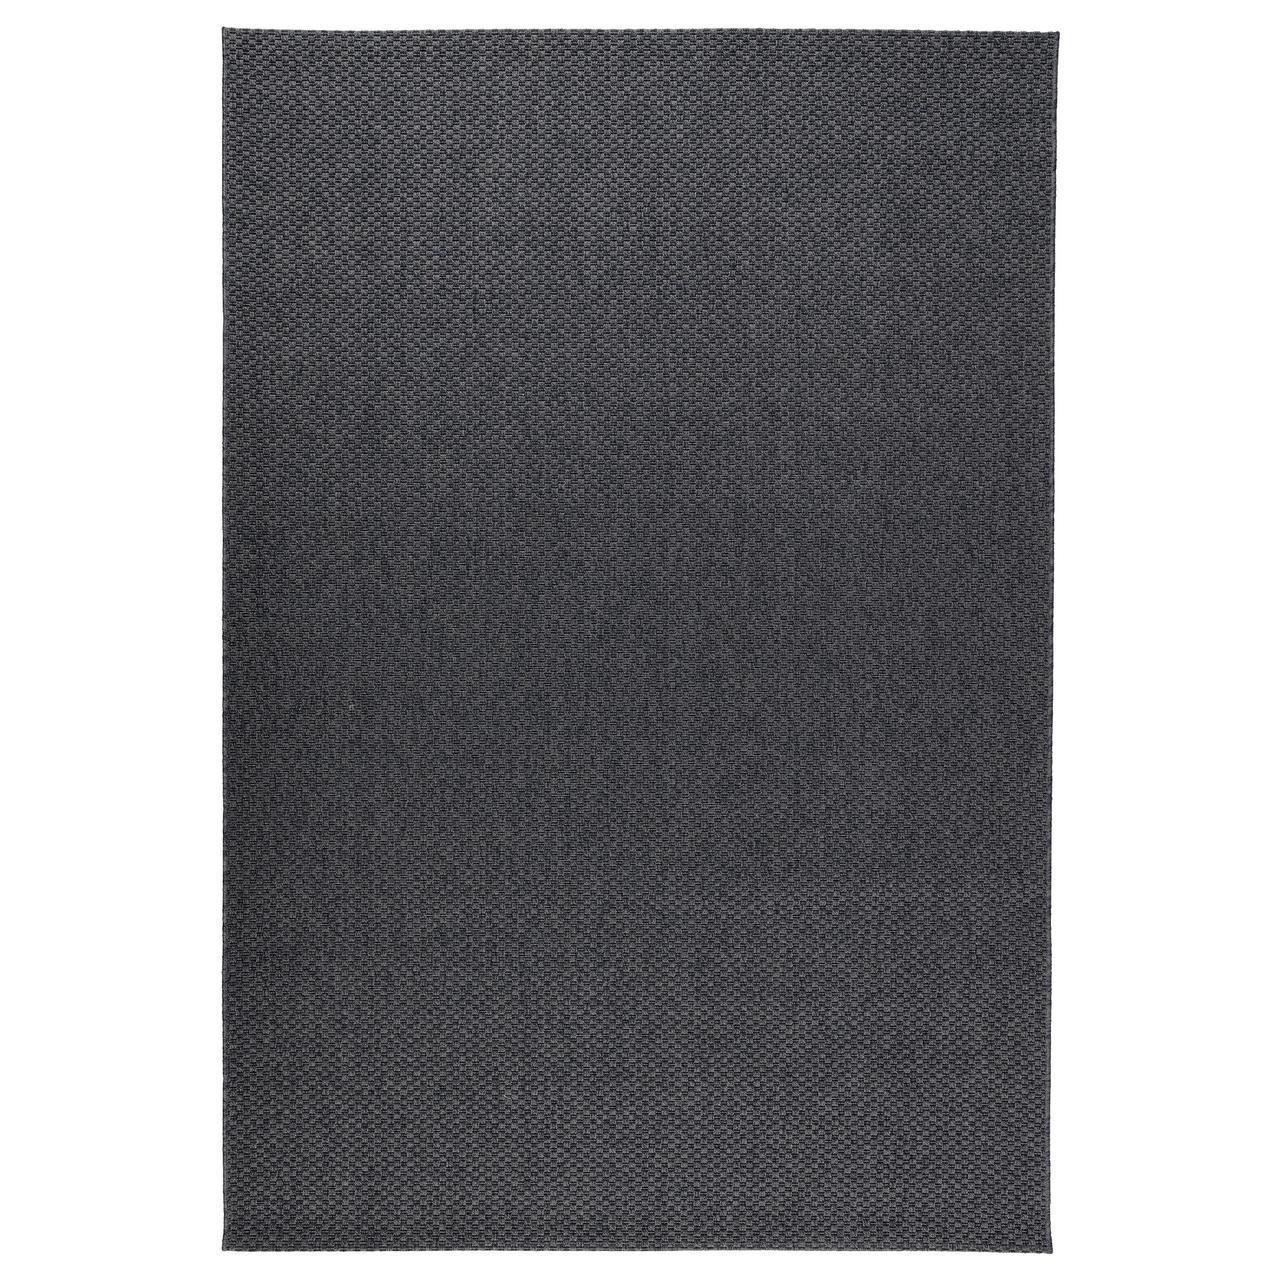 IKEA MORUM (402.035.57) Ковер, внутри/снаружи темно-серый